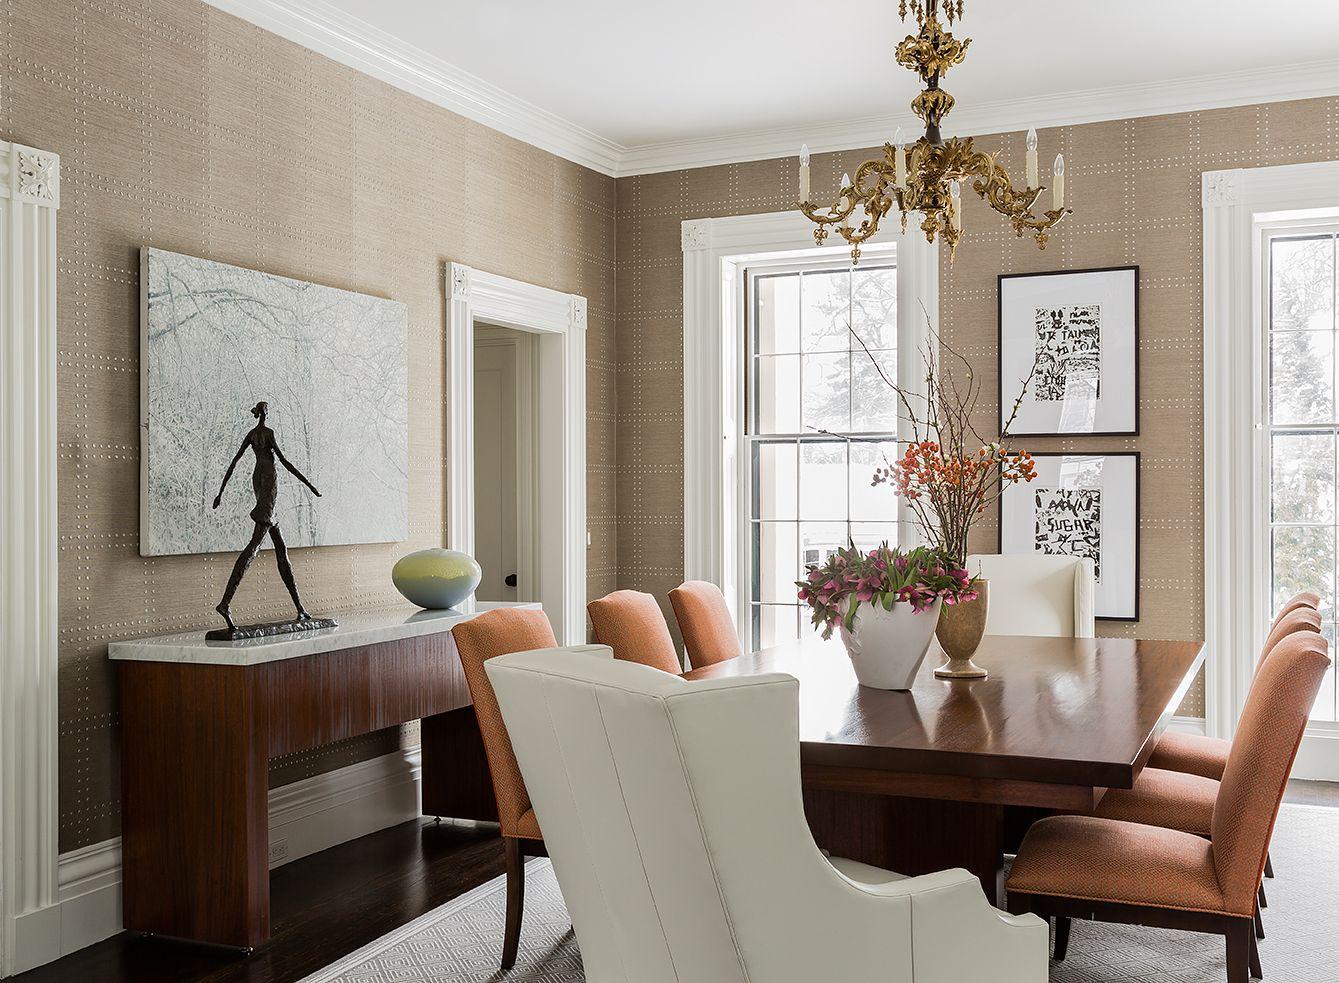 jamaica pond residence - elms interior design - dining room